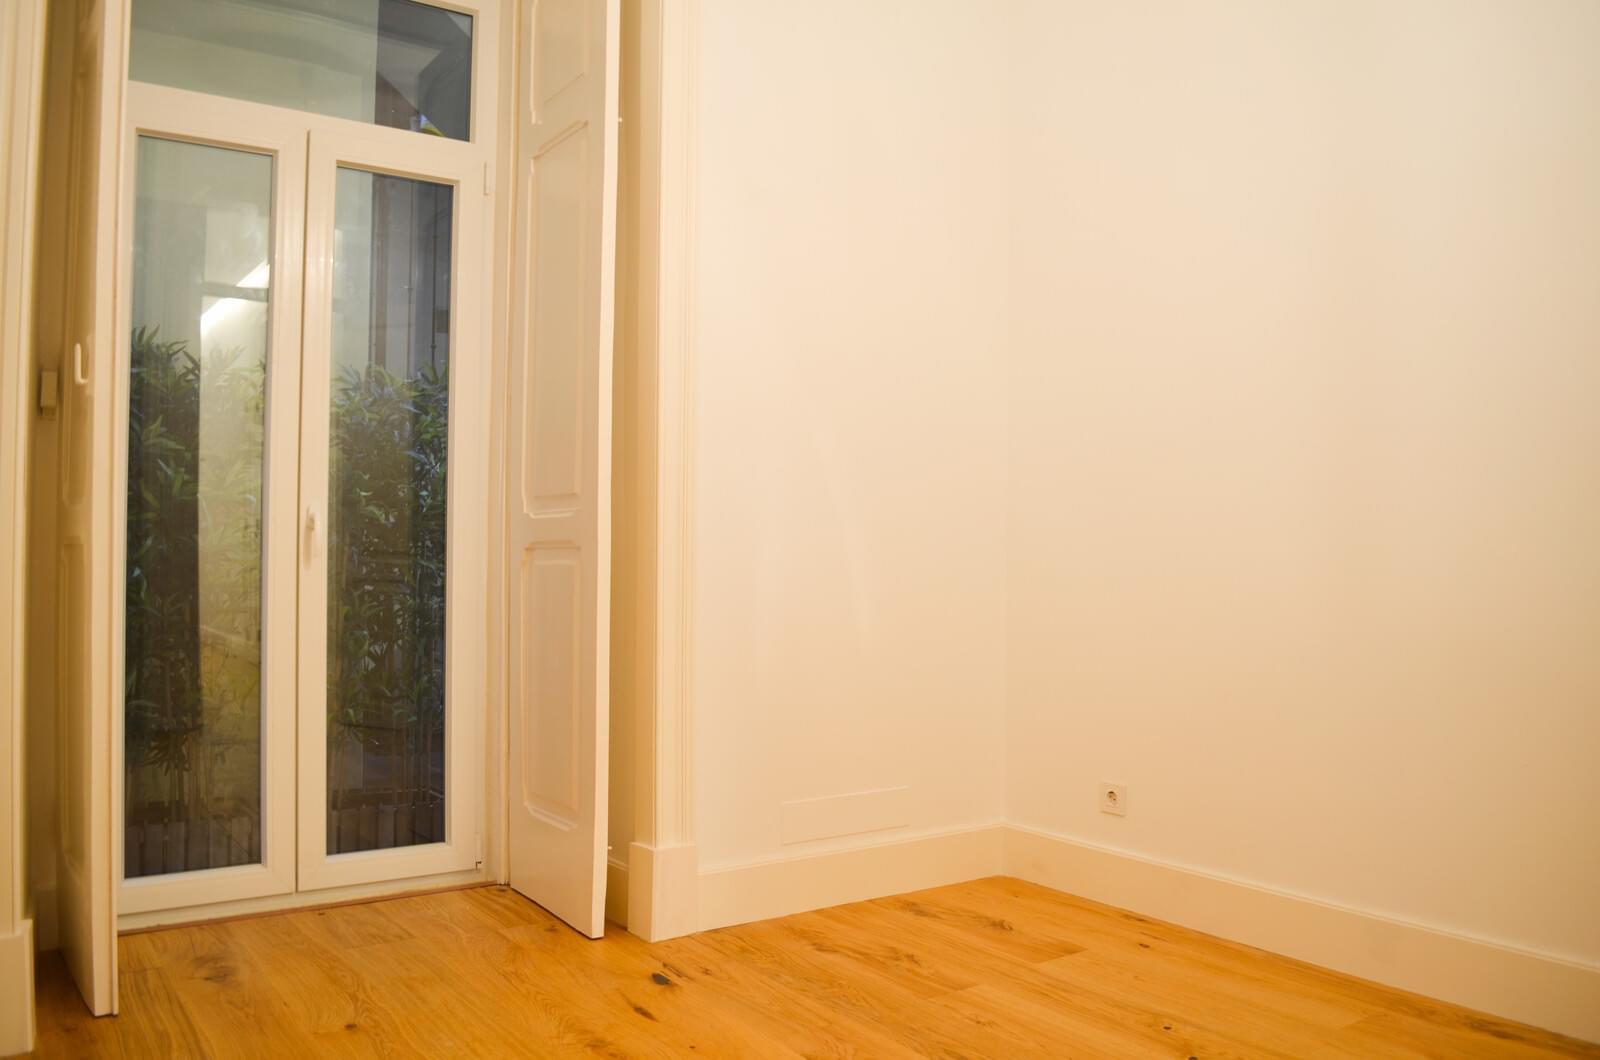 pf18801-apartamento-t2-lisboa-8391bbd8-3142-44be-911e-fbf525cfdb8f